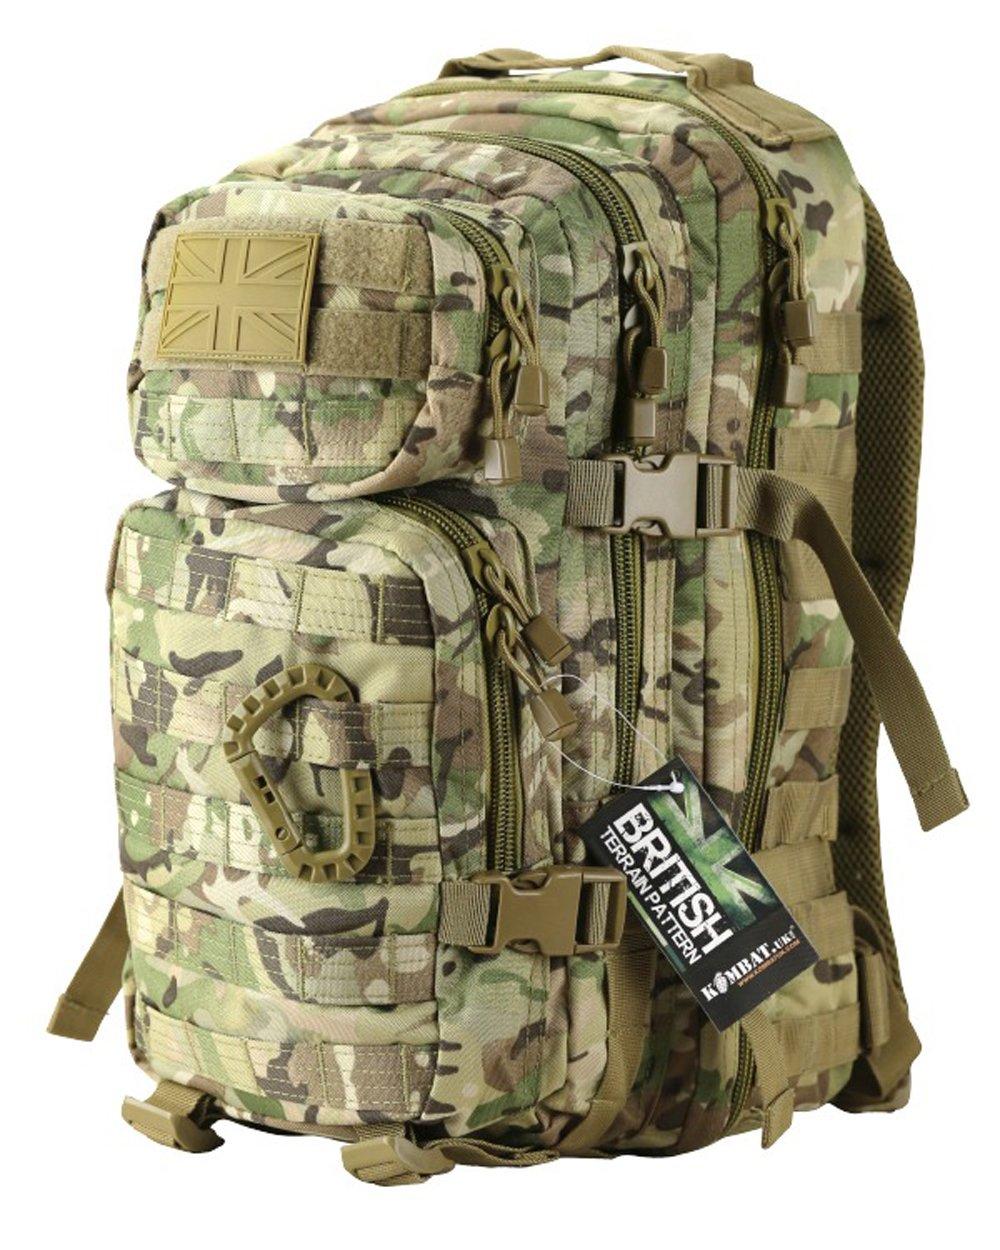 Uk Army Surplus Backpack - CEAGESP